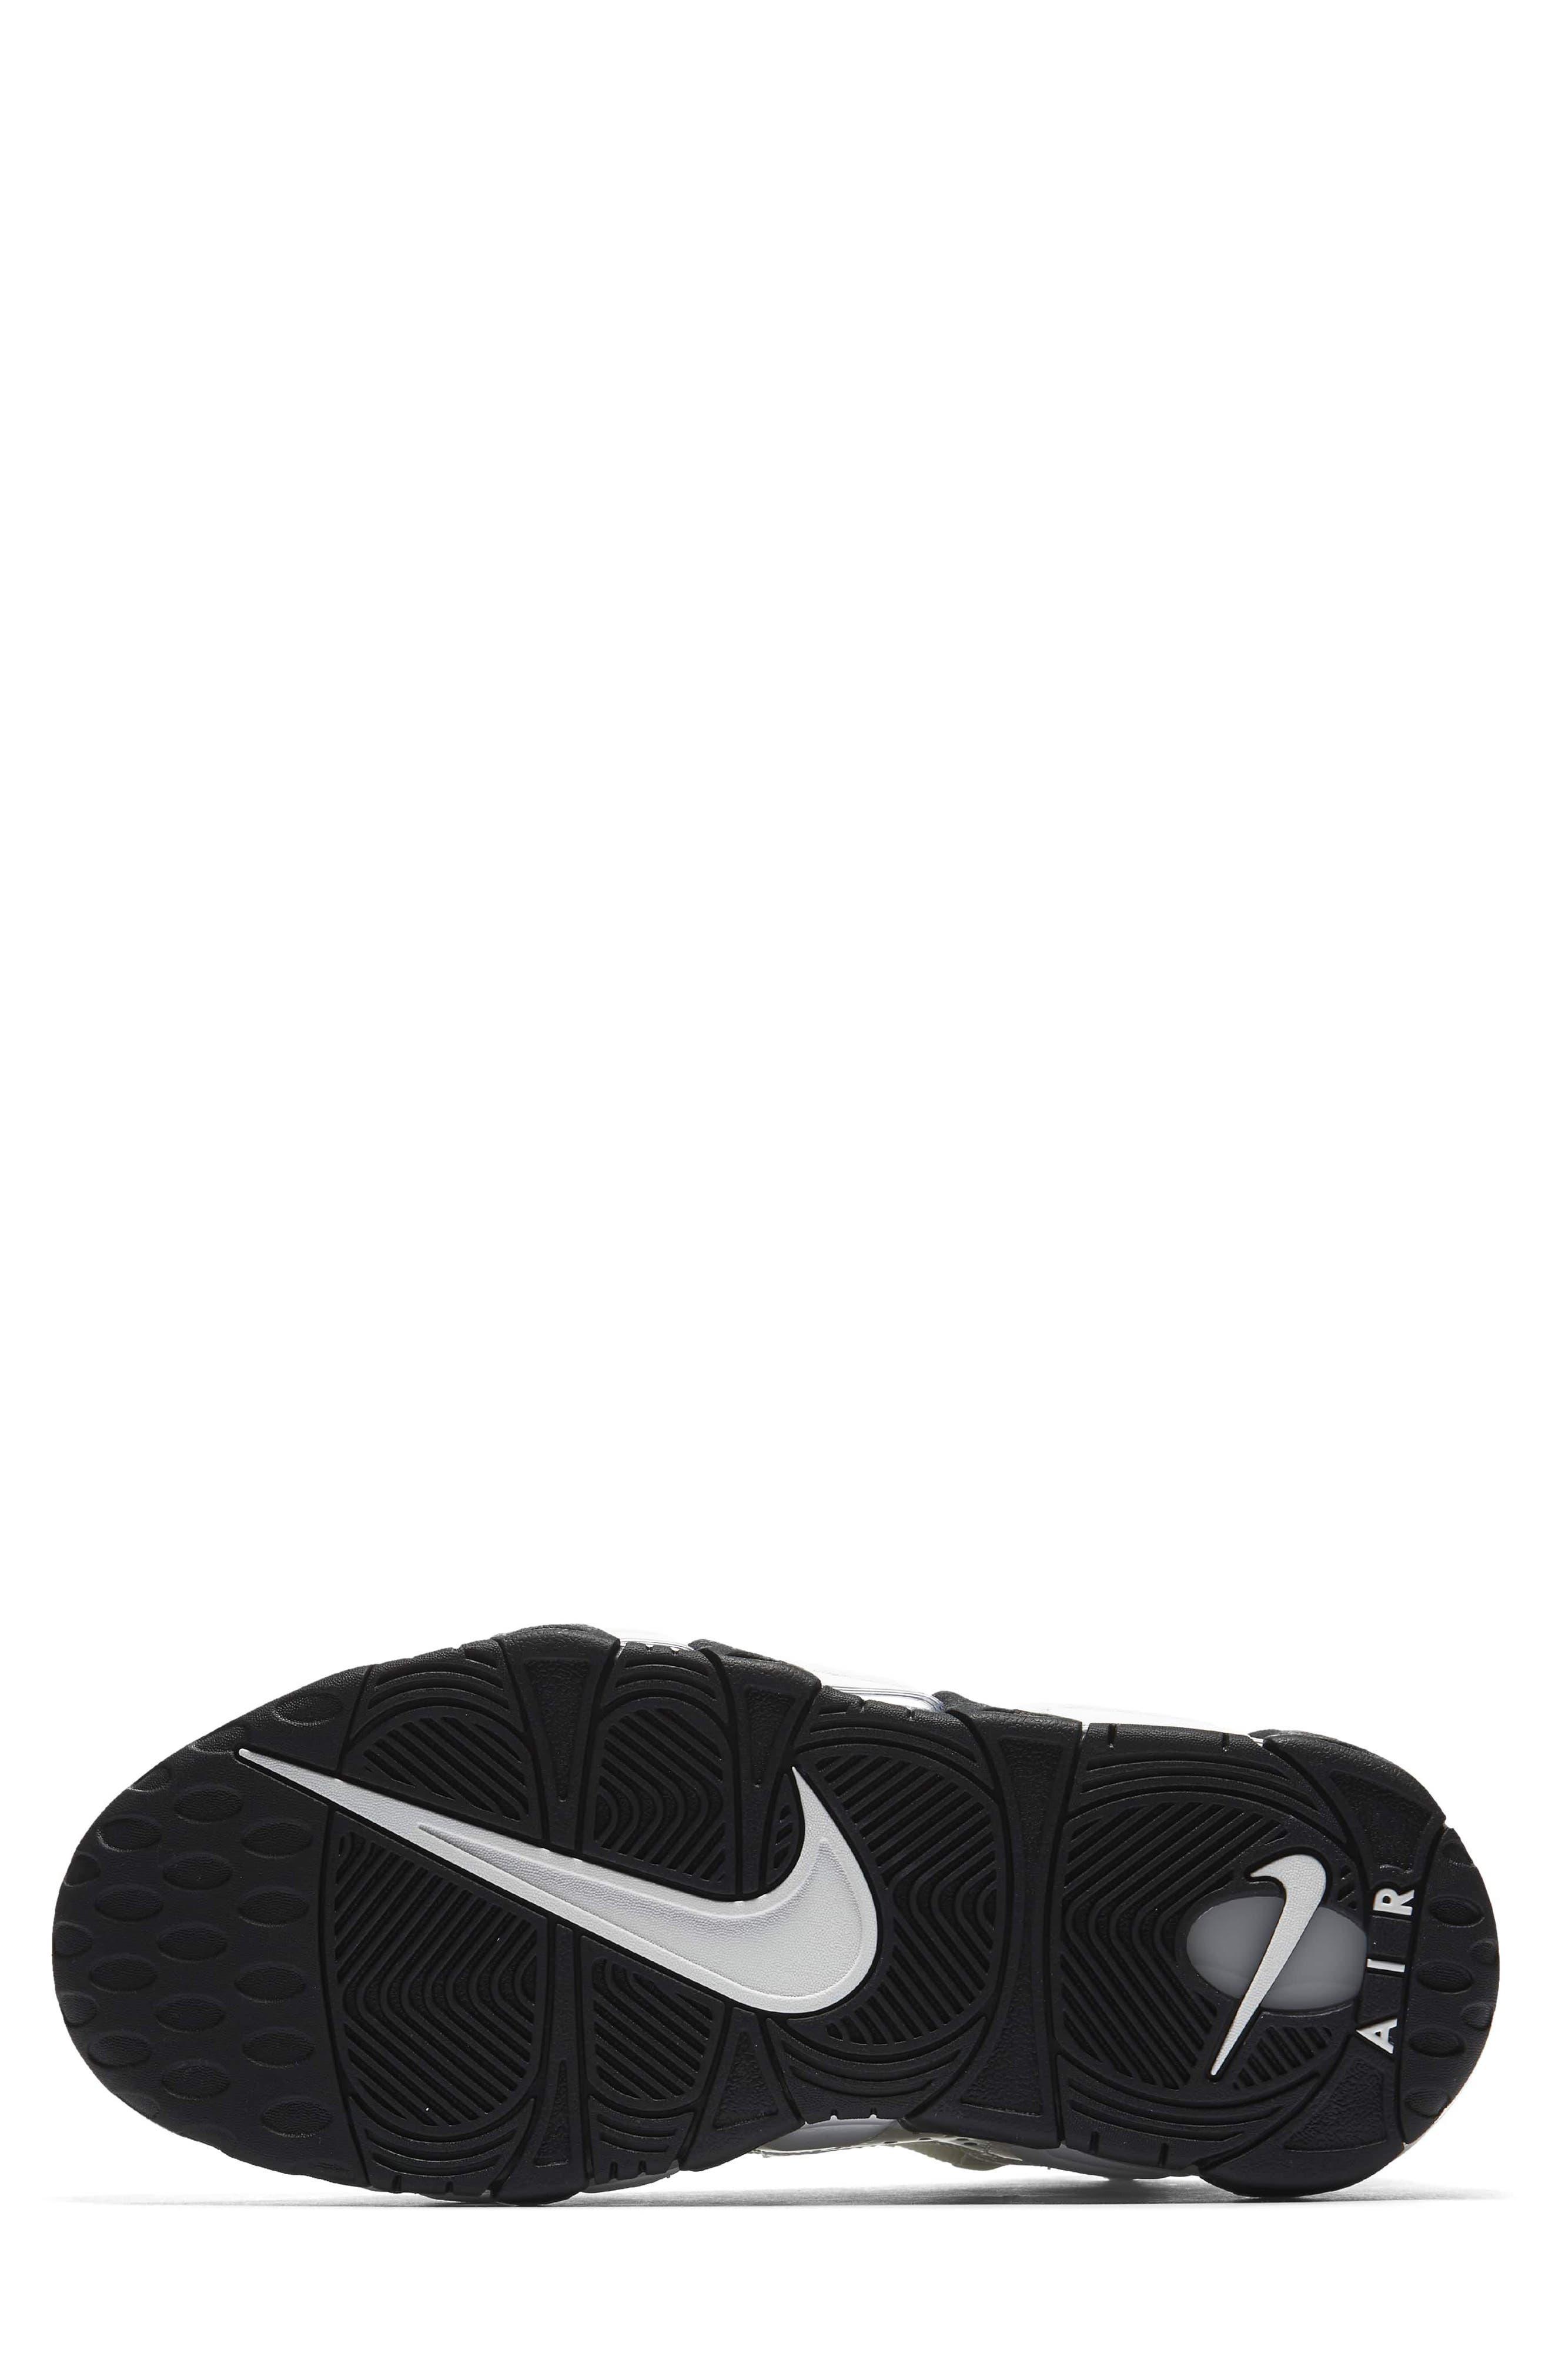 Air More Money LX Sneaker,                             Alternate thumbnail 5, color,                             Summit White/ Black